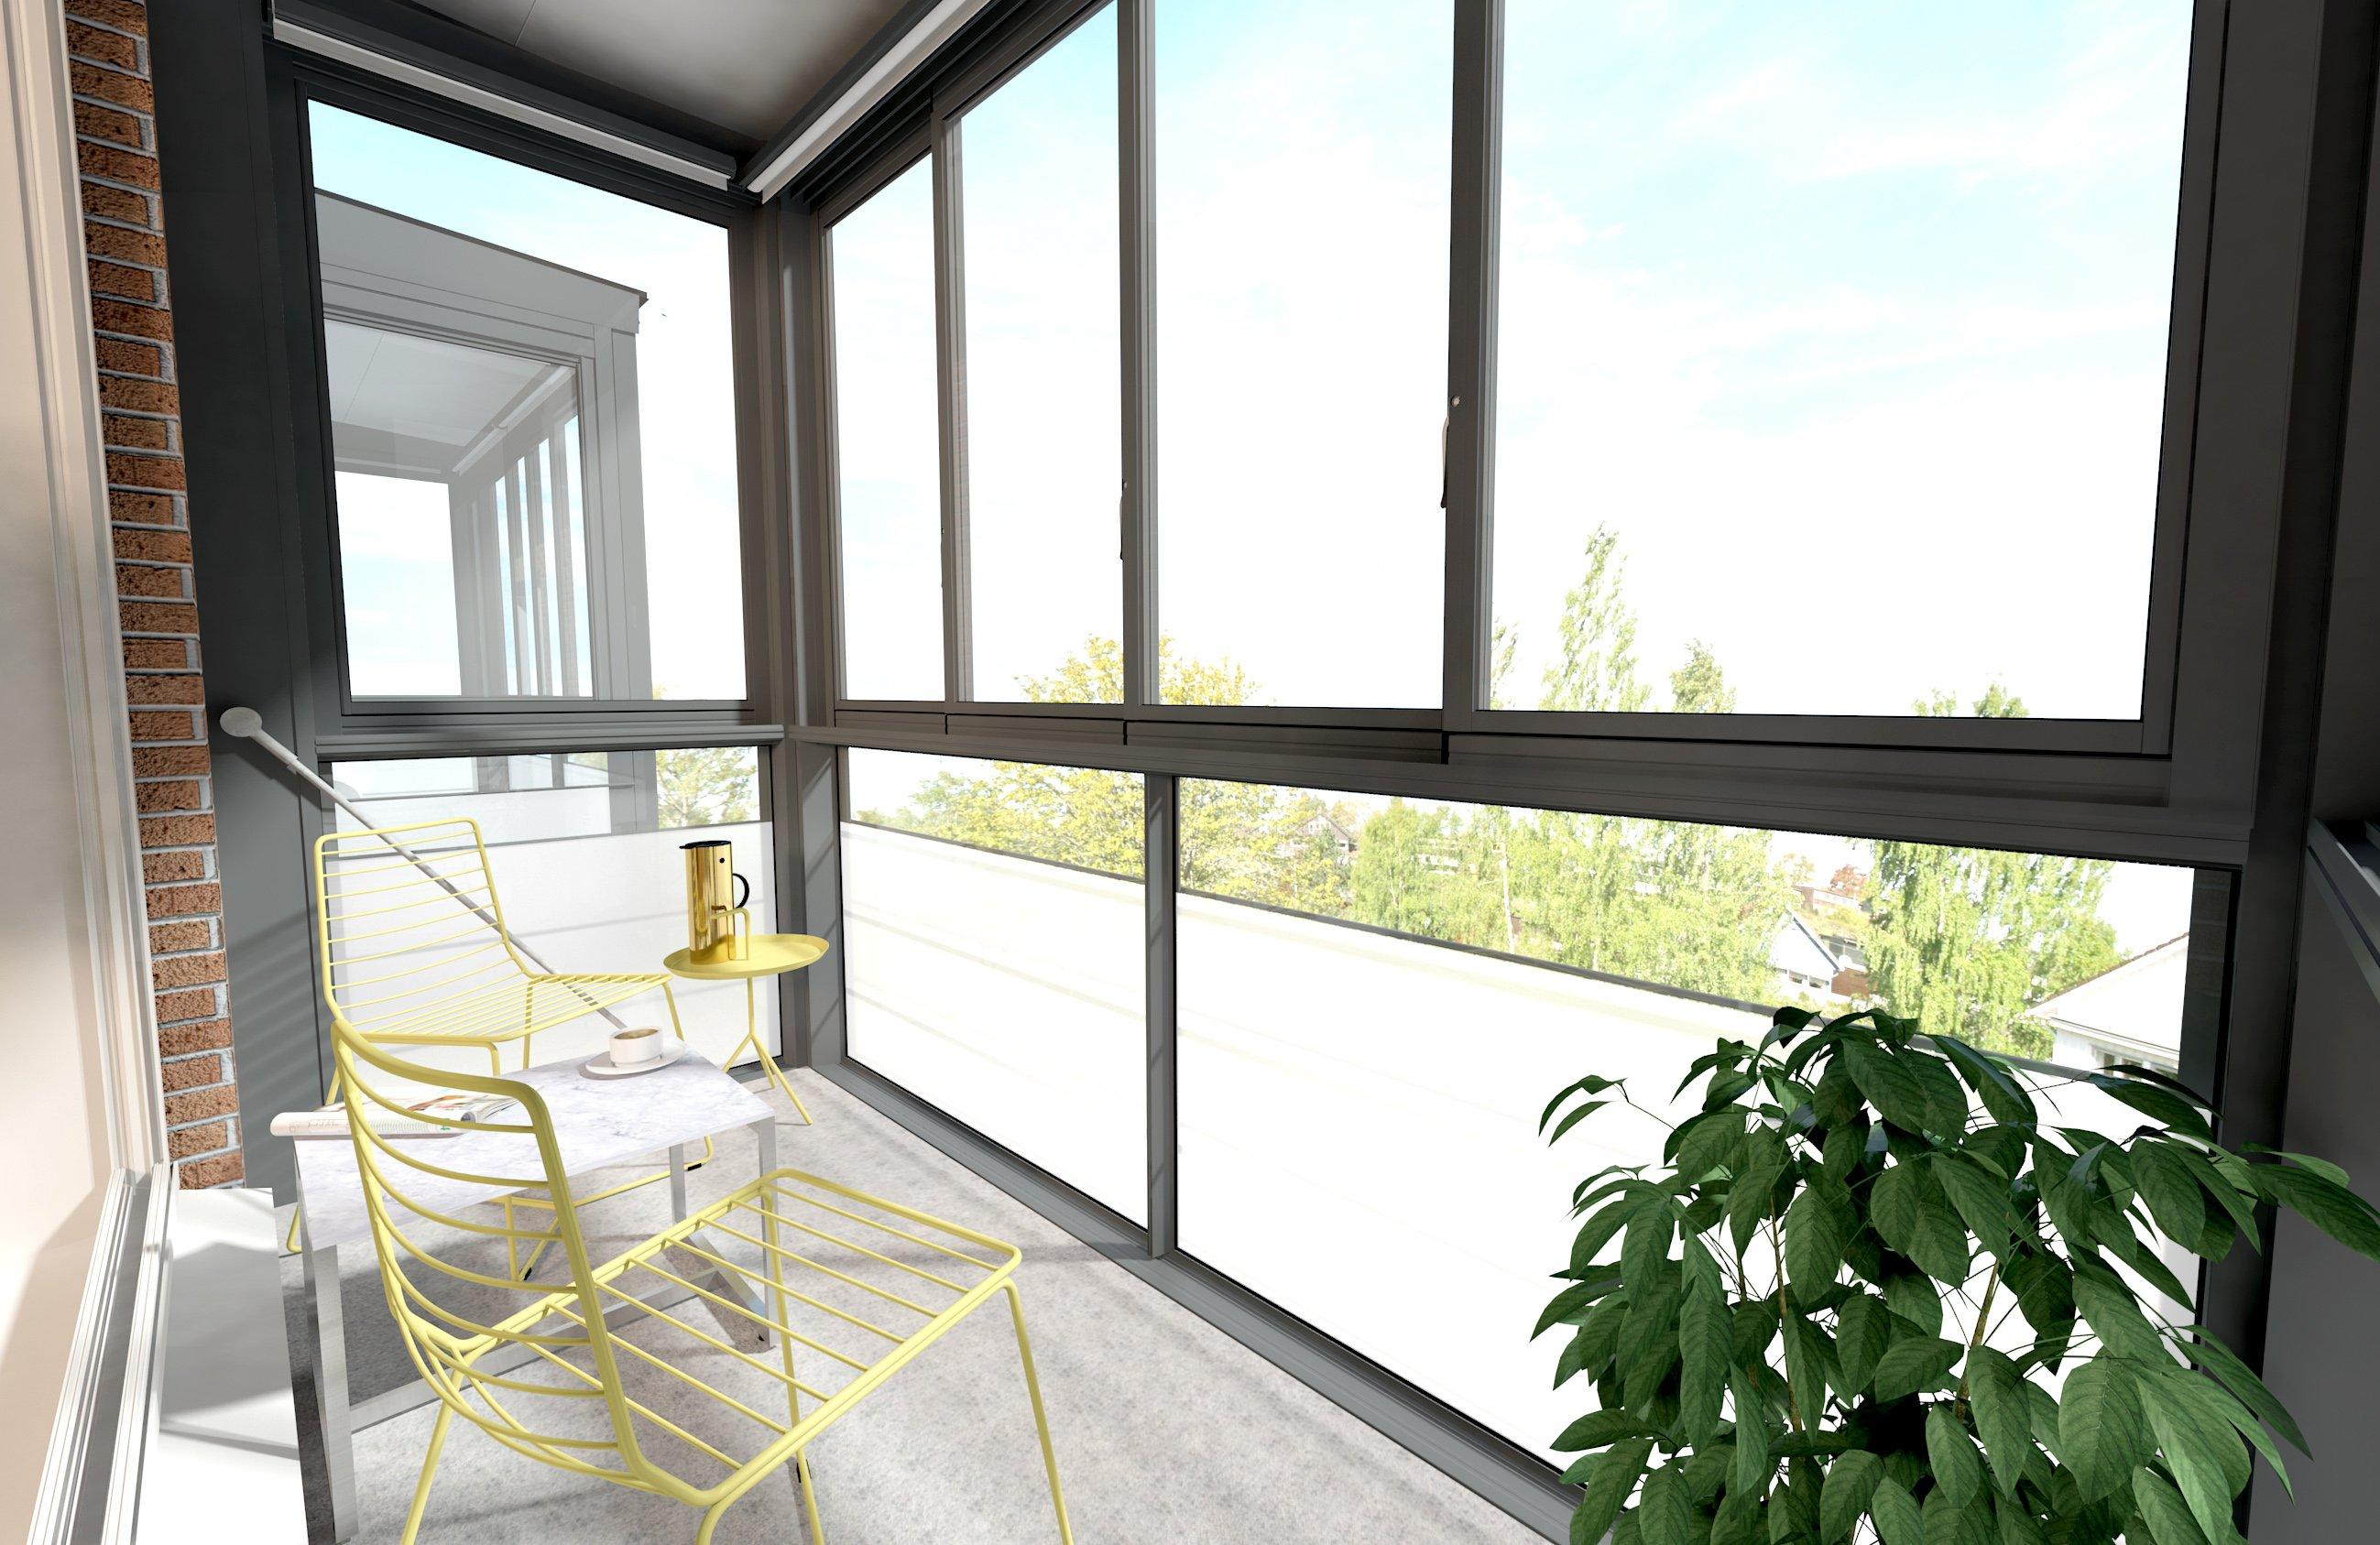 Балкон полностью застеклен